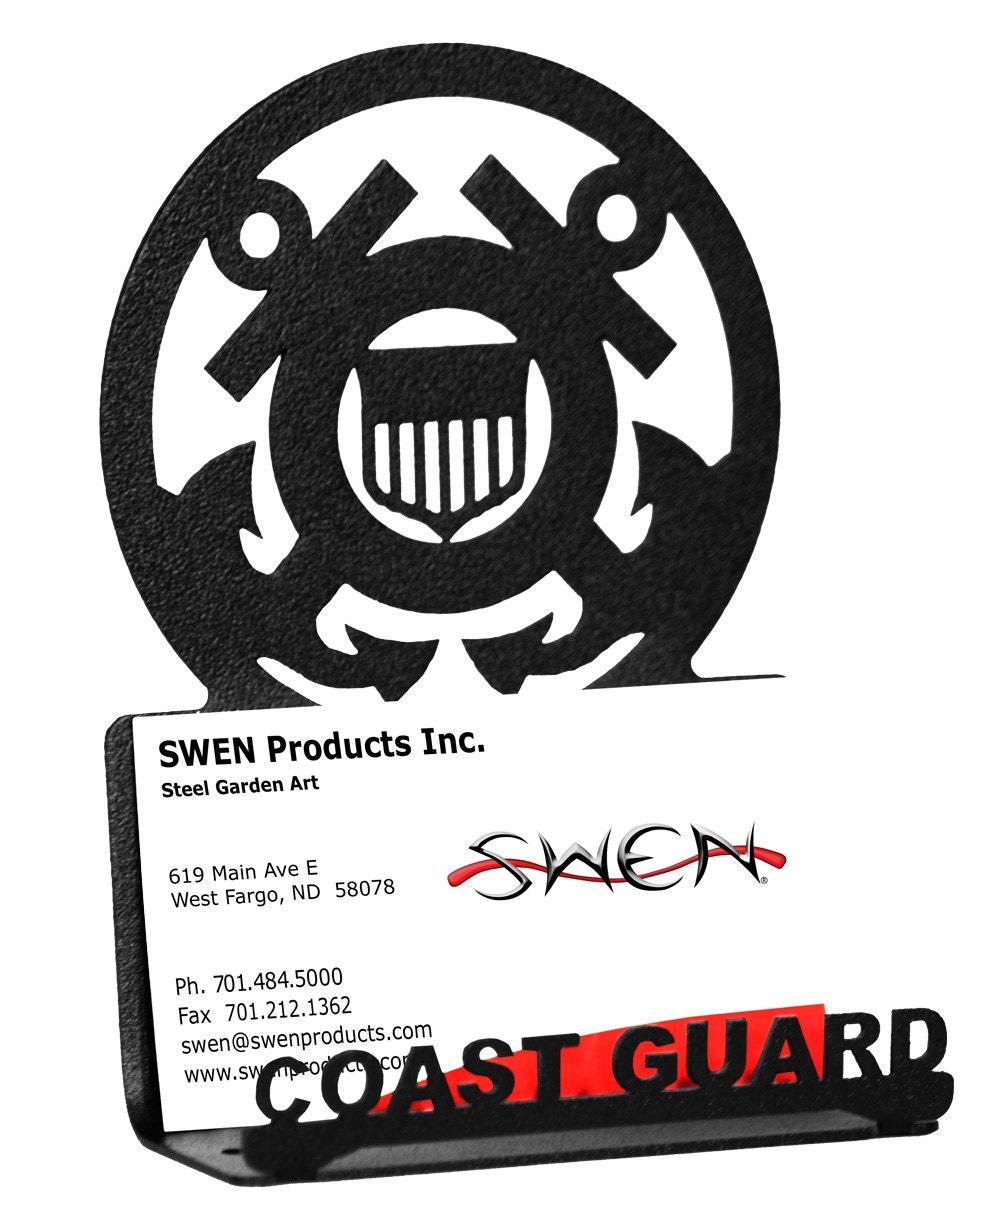 Armed Services US Coast Guard USCG Black Metal Business Card Holder ...